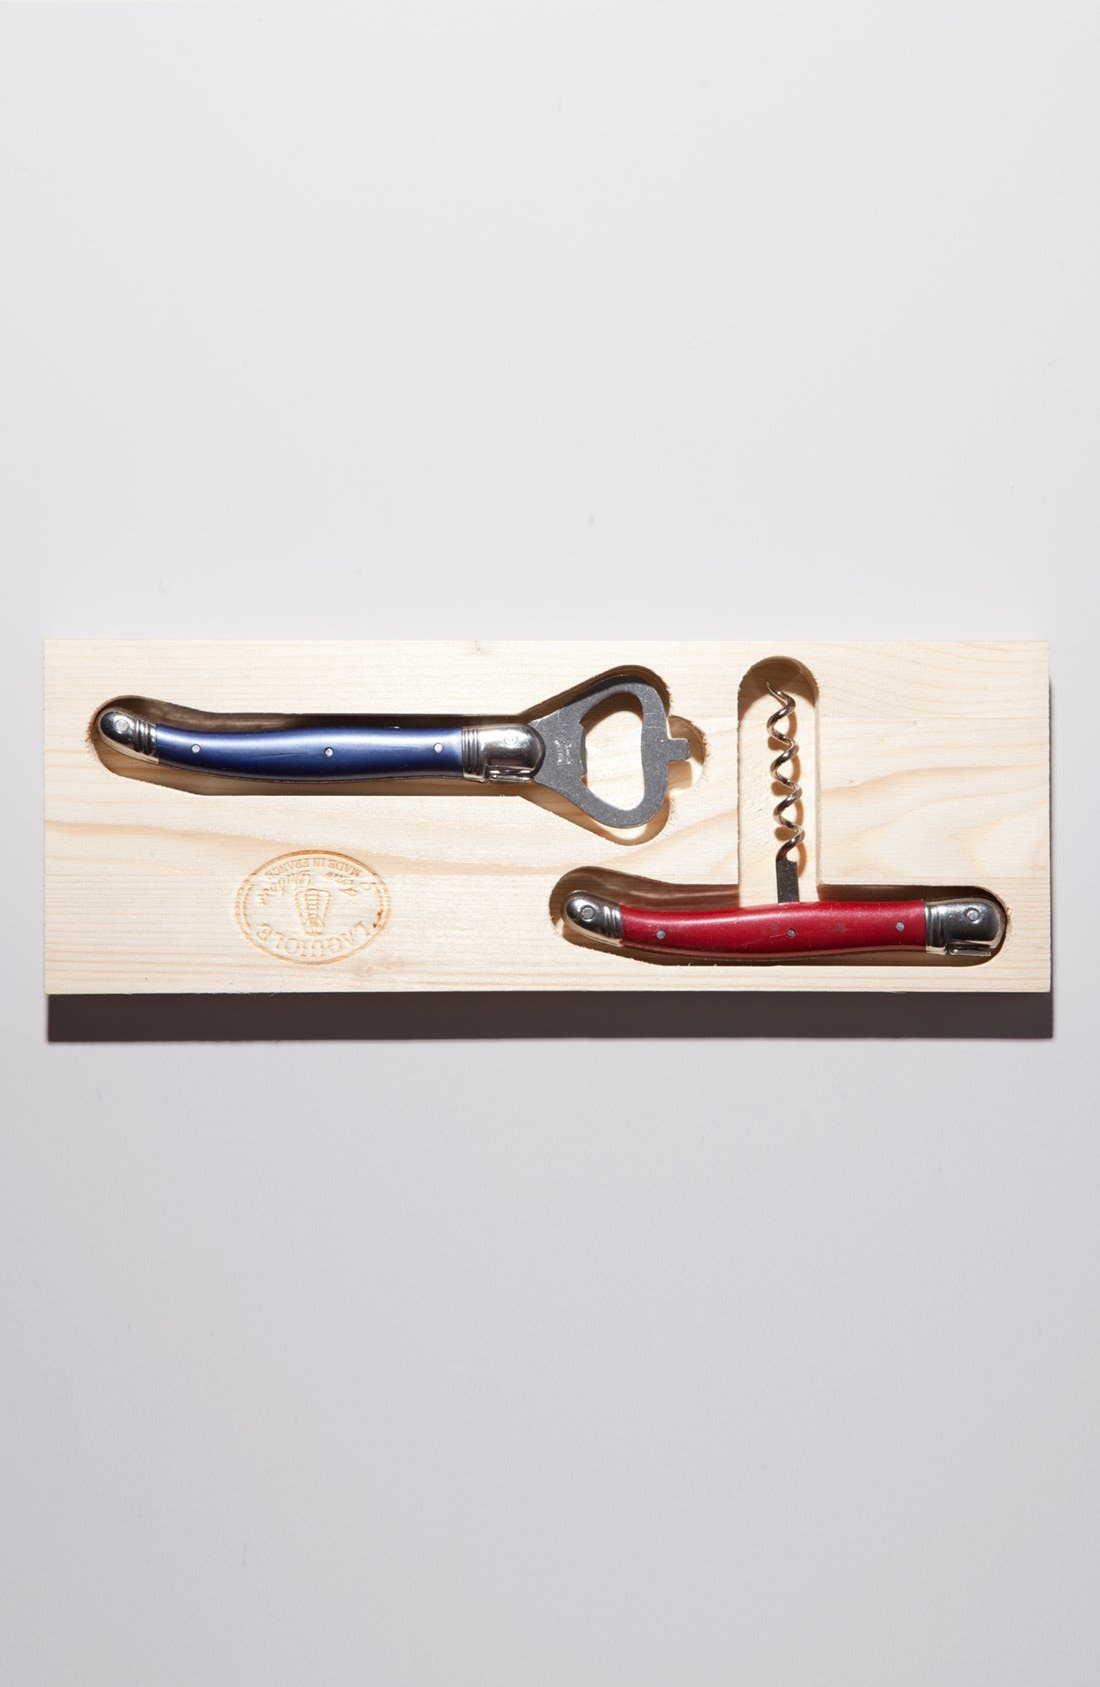 Main Image - Laguiole by Jean Dubost Corkscrew & Bottle Opener Set